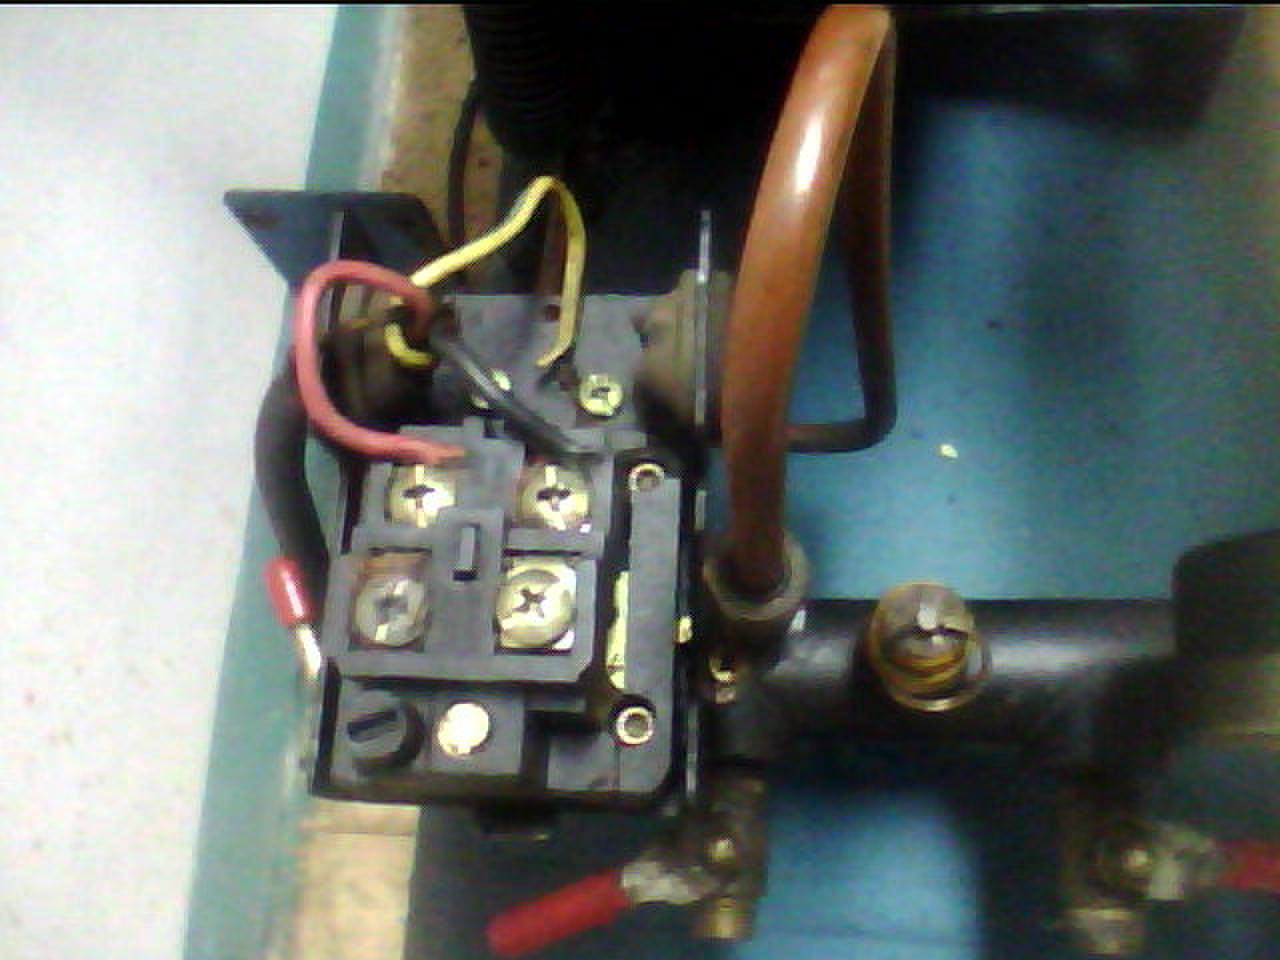 380v交流电机接线图 三相380v电机接线图 380v电机要接线图片